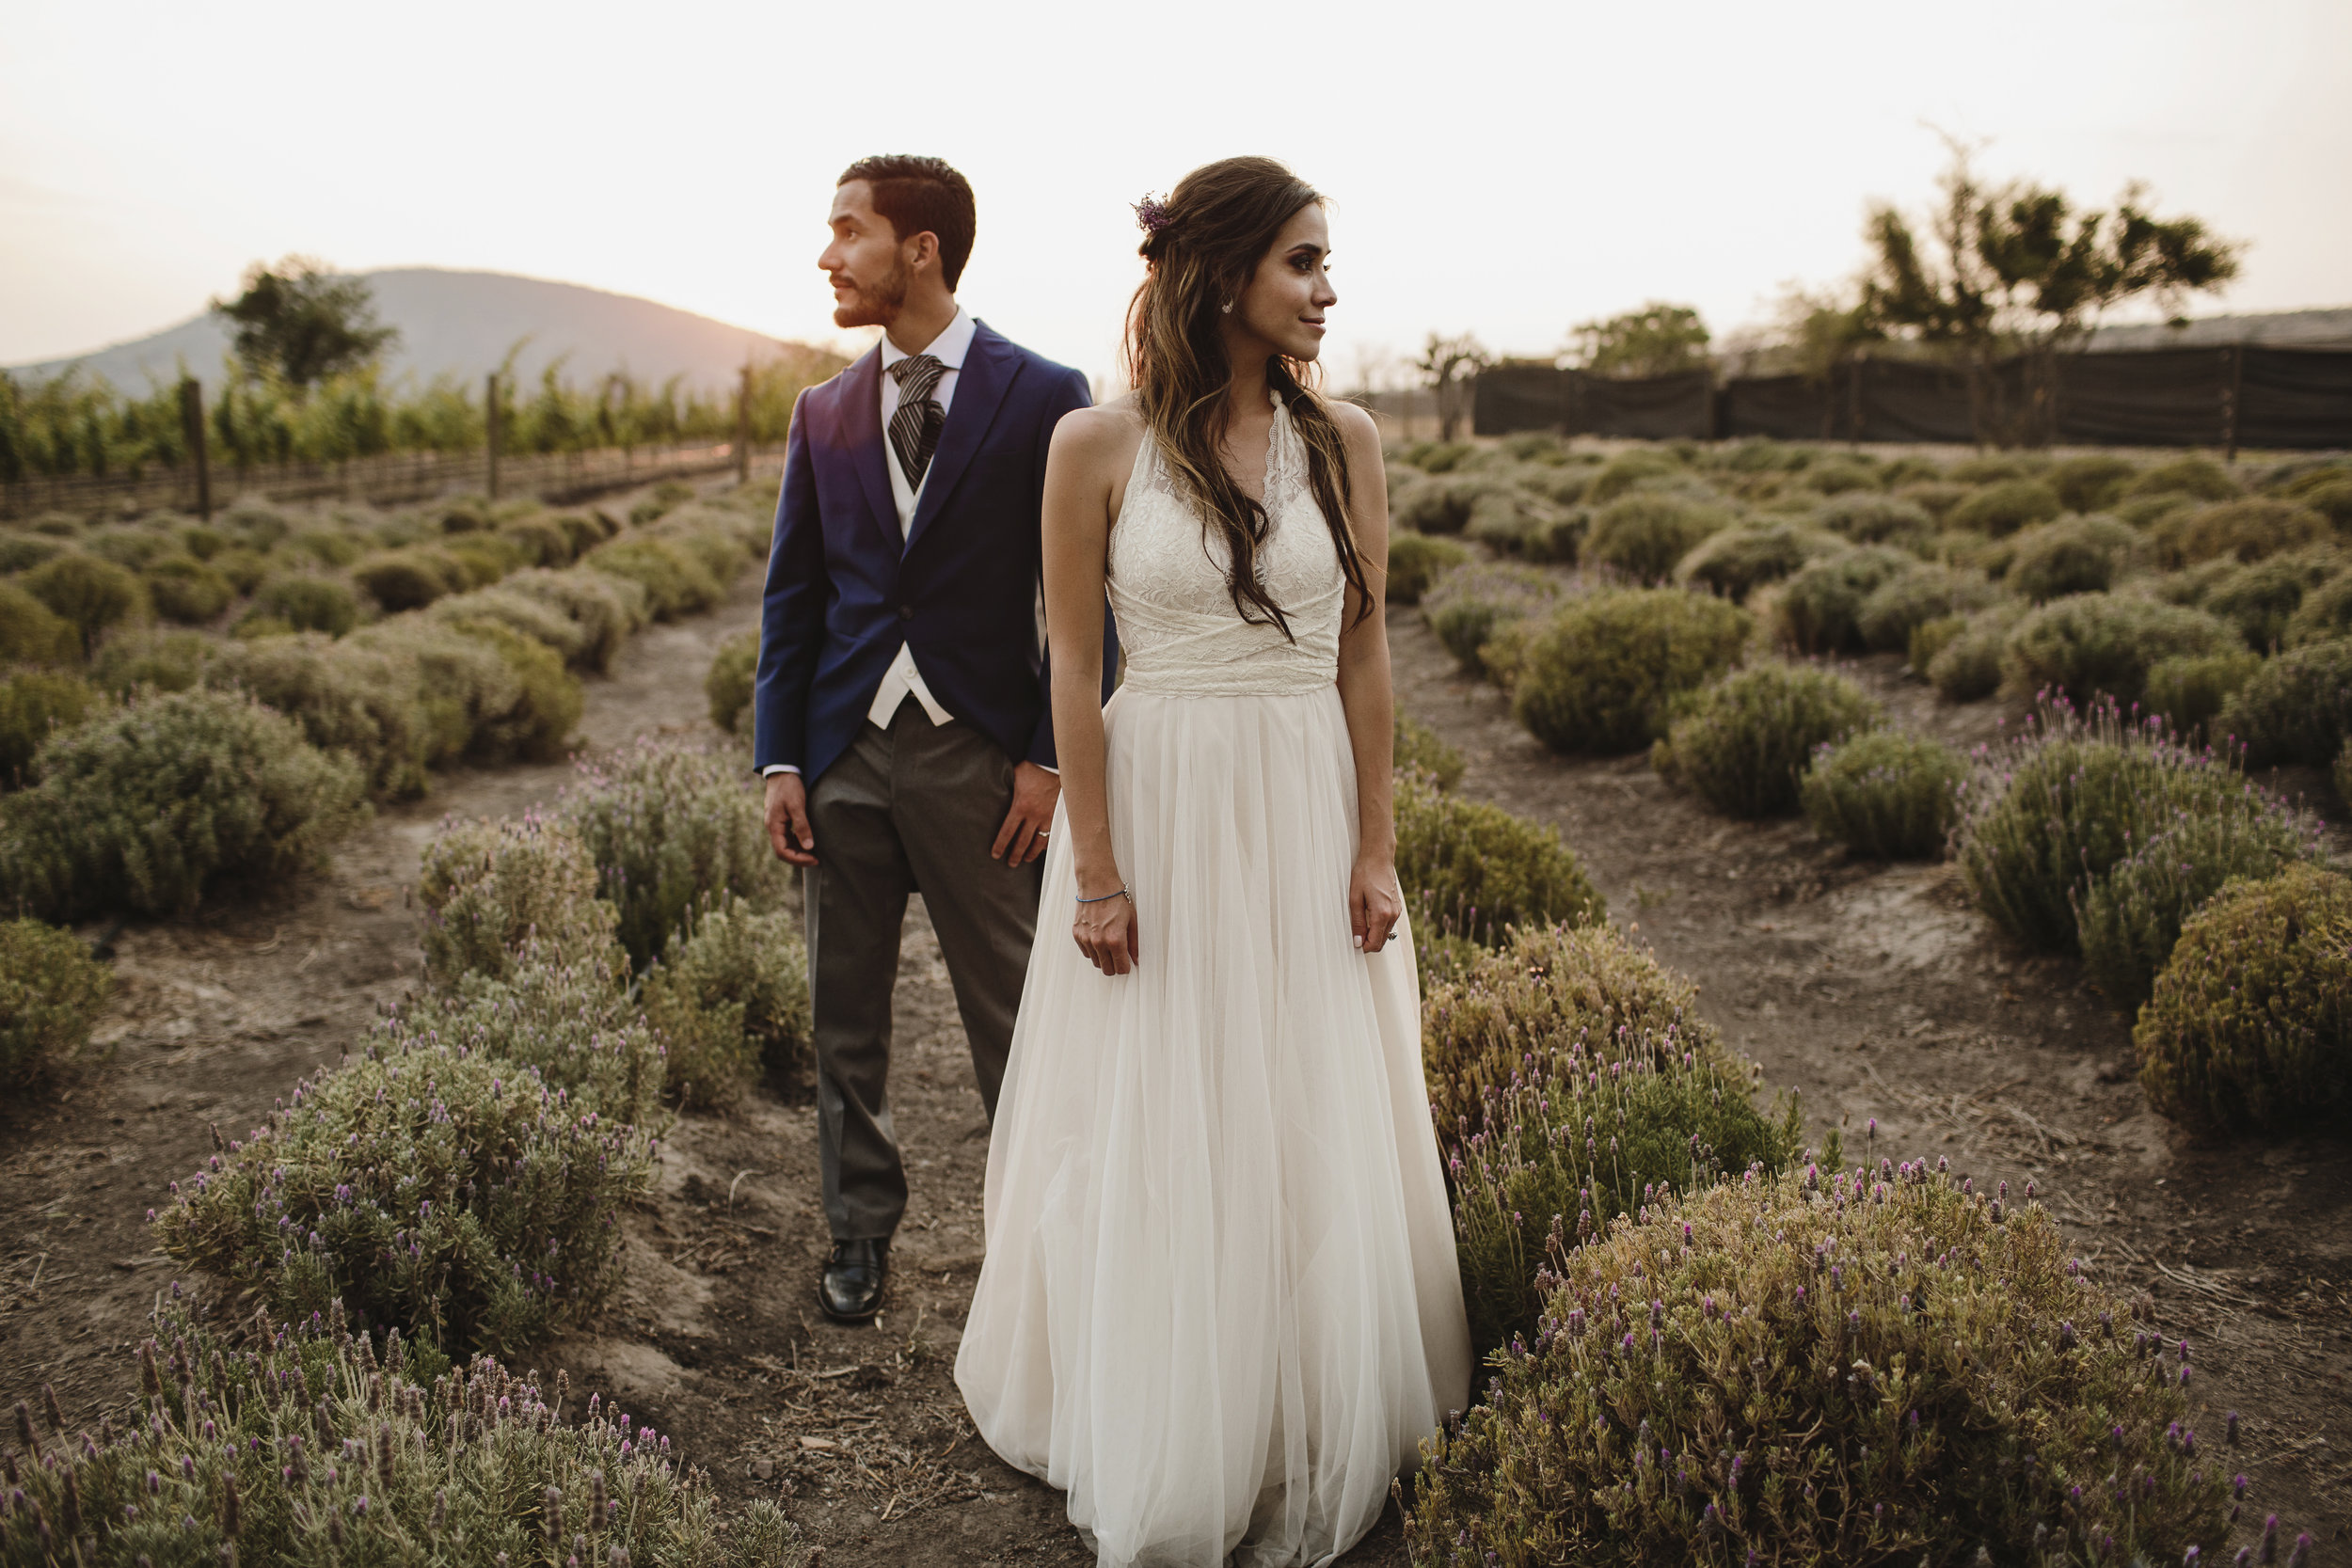 alfons_flores_destination_wedding_photography_mavi_david-1882.JPG